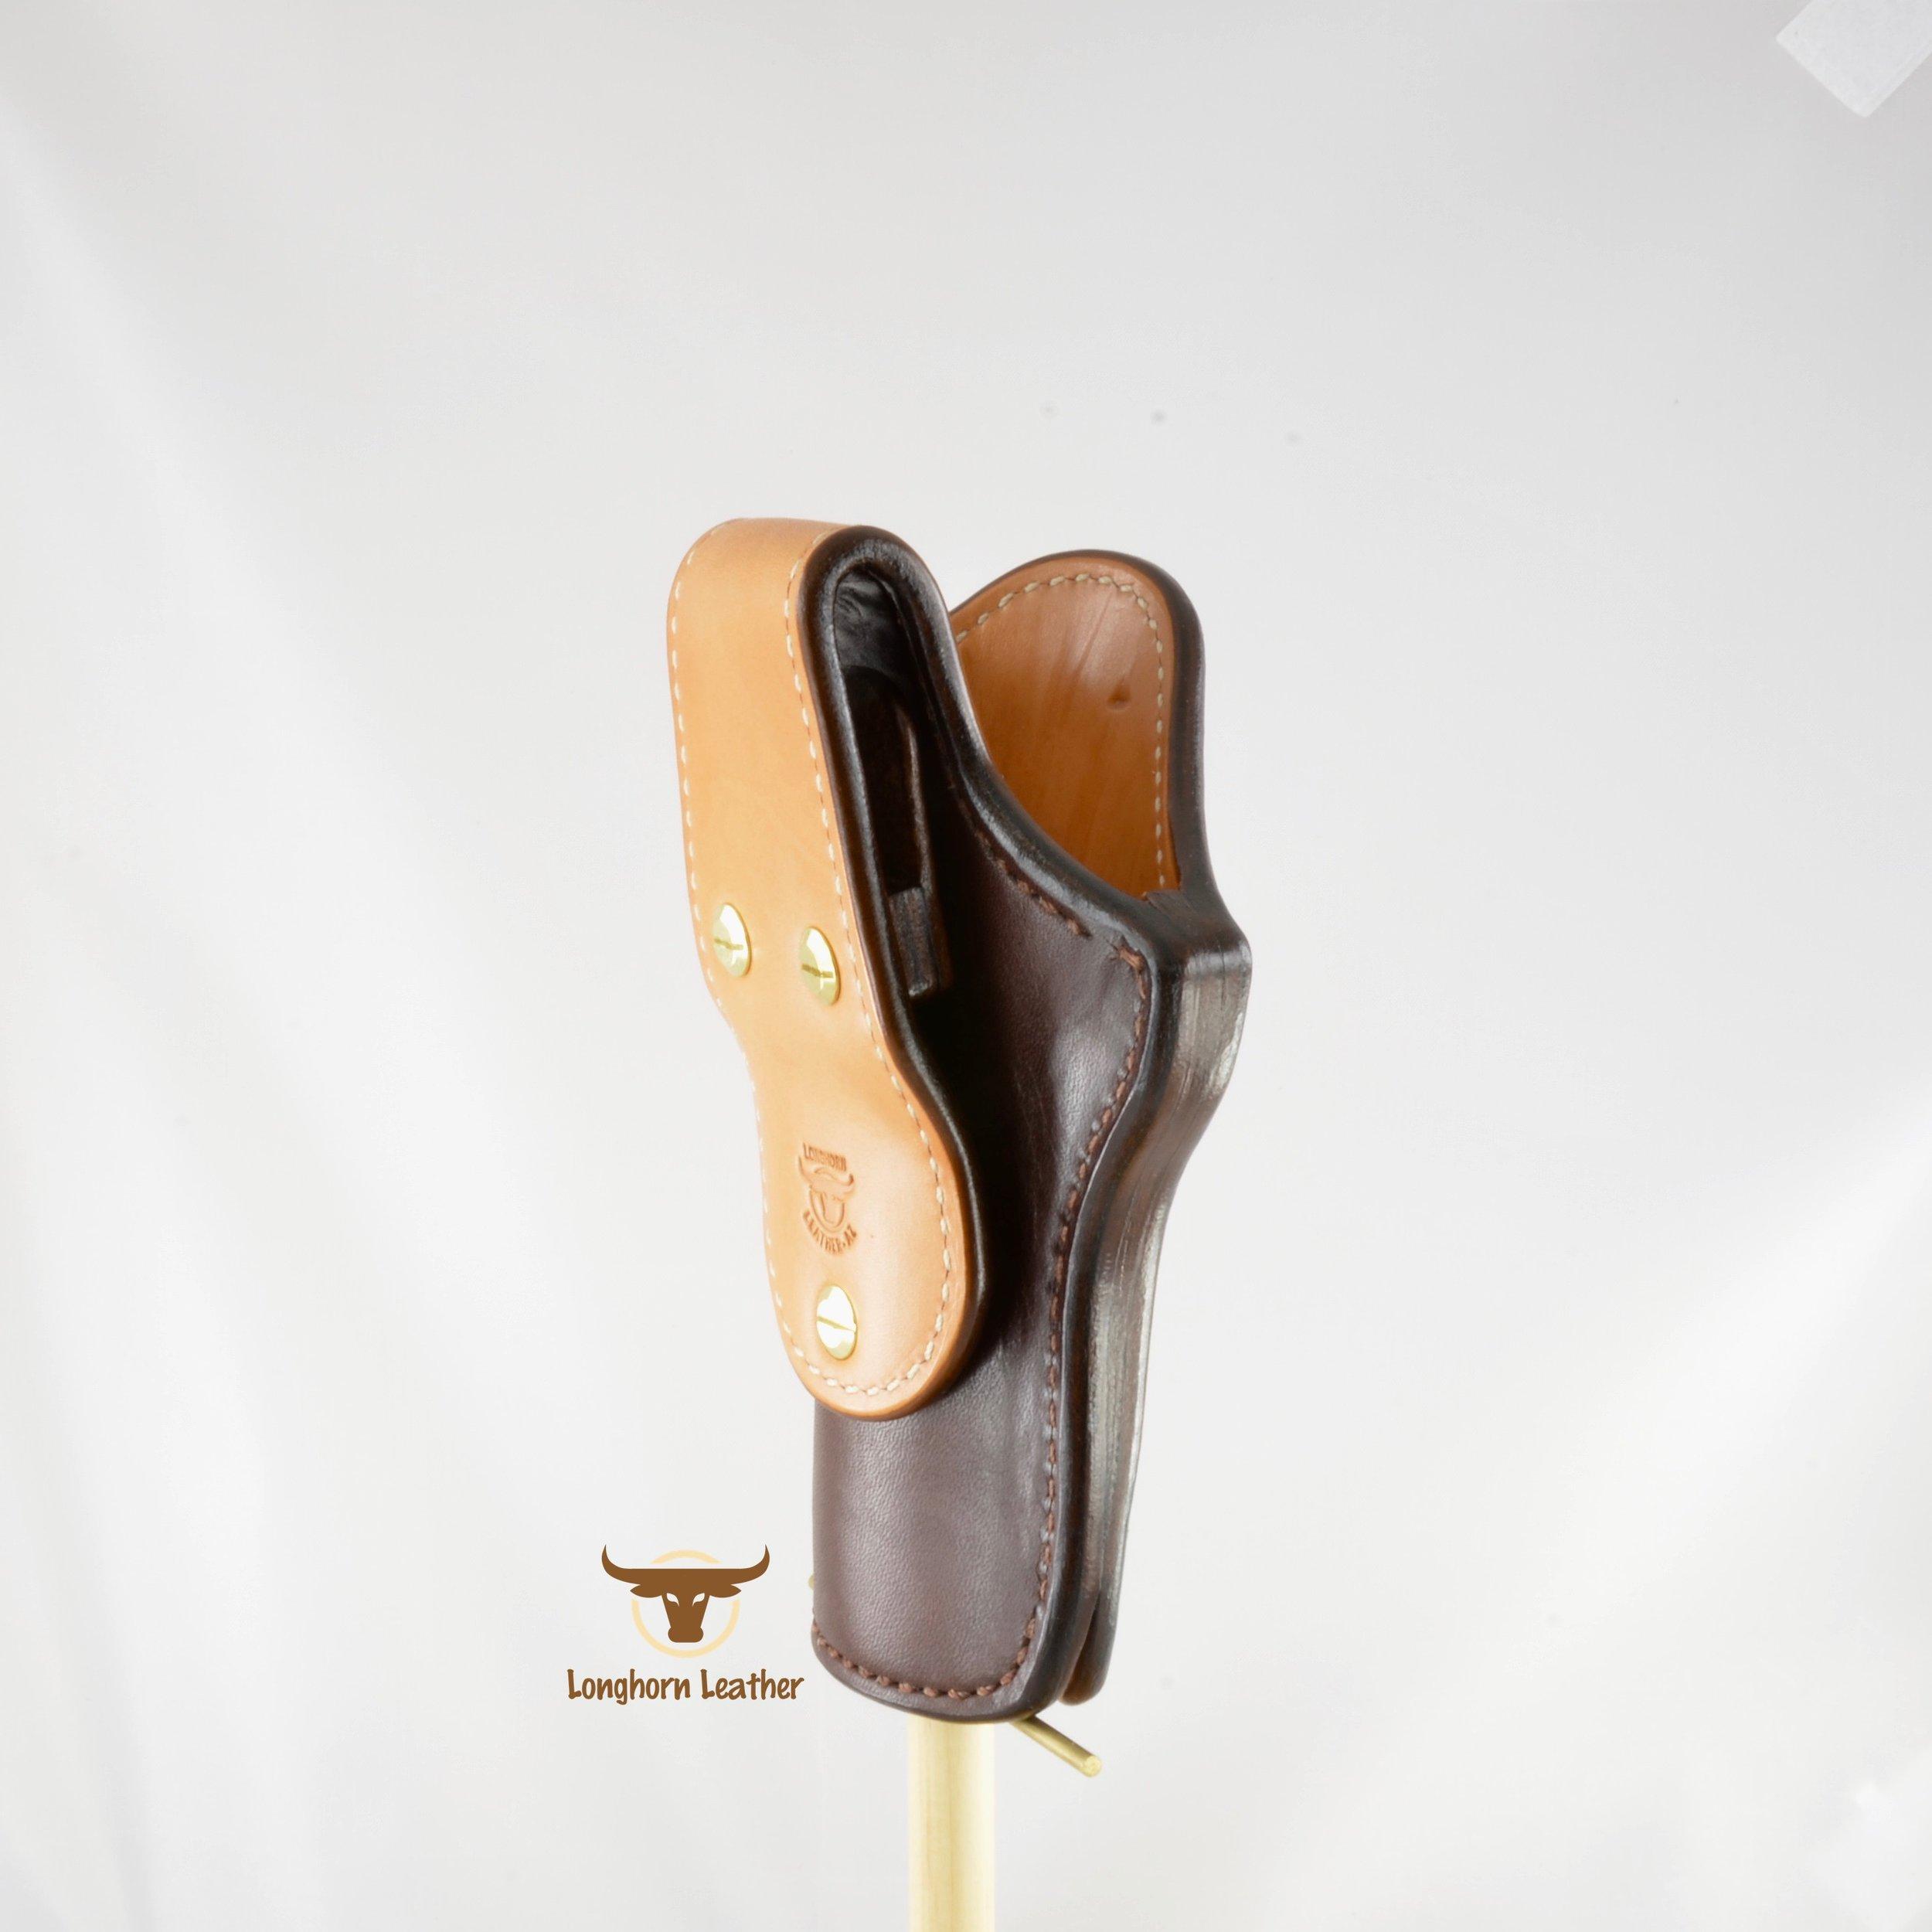 Longhorn Leather AZ - 1911 Holster featurng the %22San Carlos%22 design 9.jpg